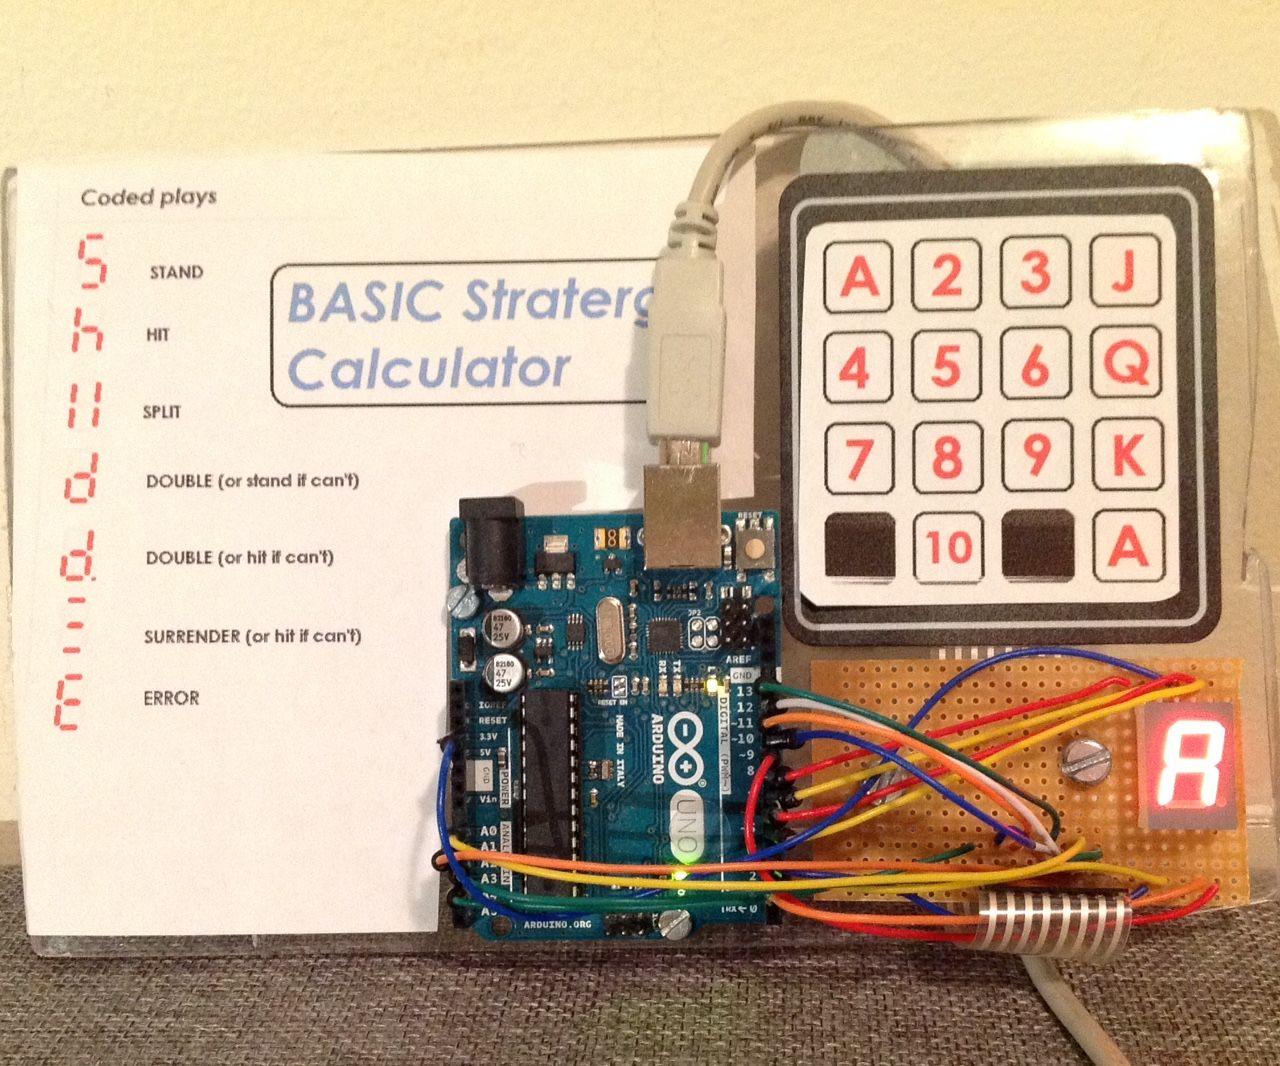 Blackjack Basic Strategy Calculator